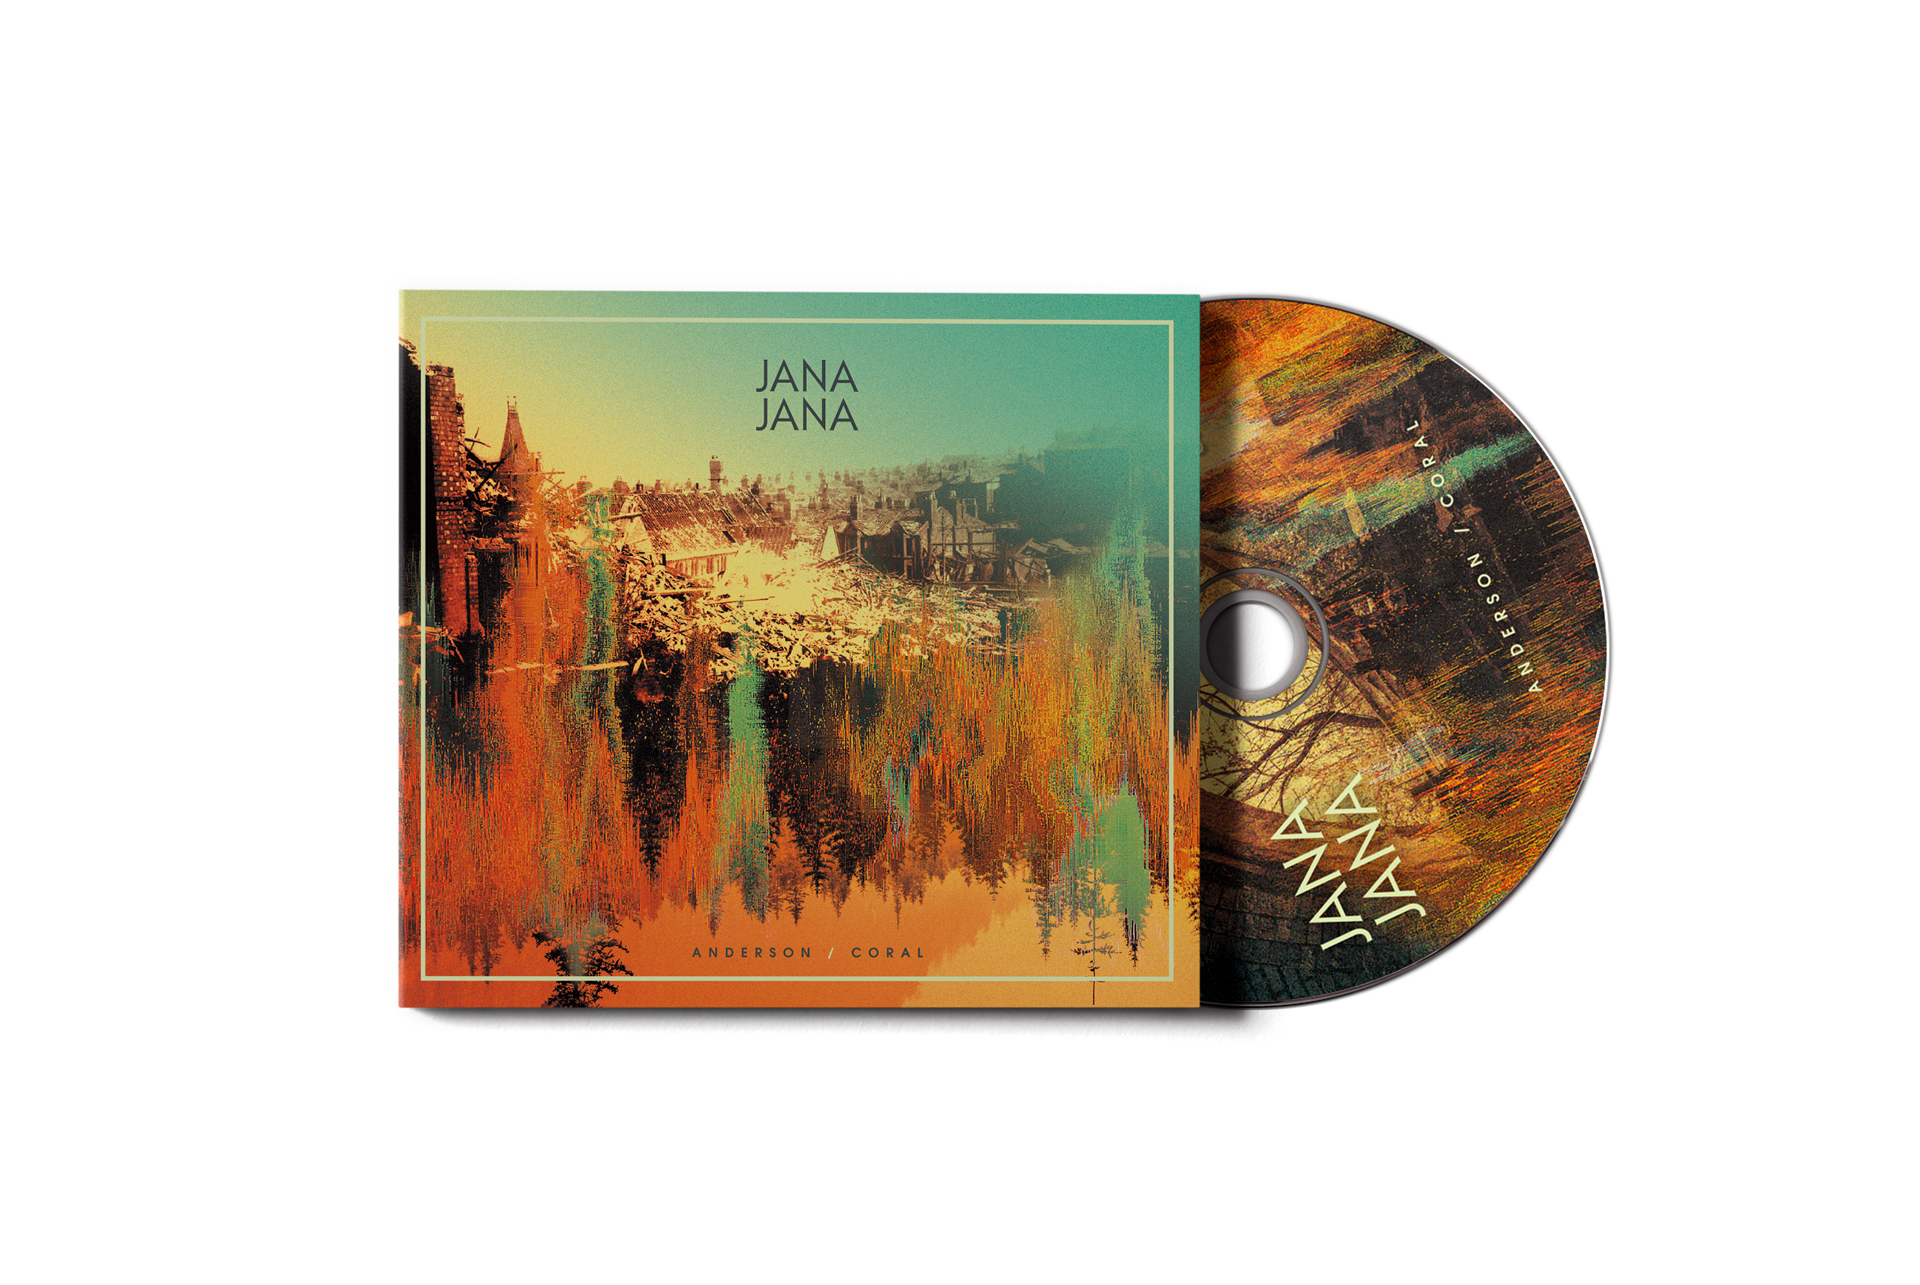 JANA-EP-Digipak-Mockup-Cover.jpg